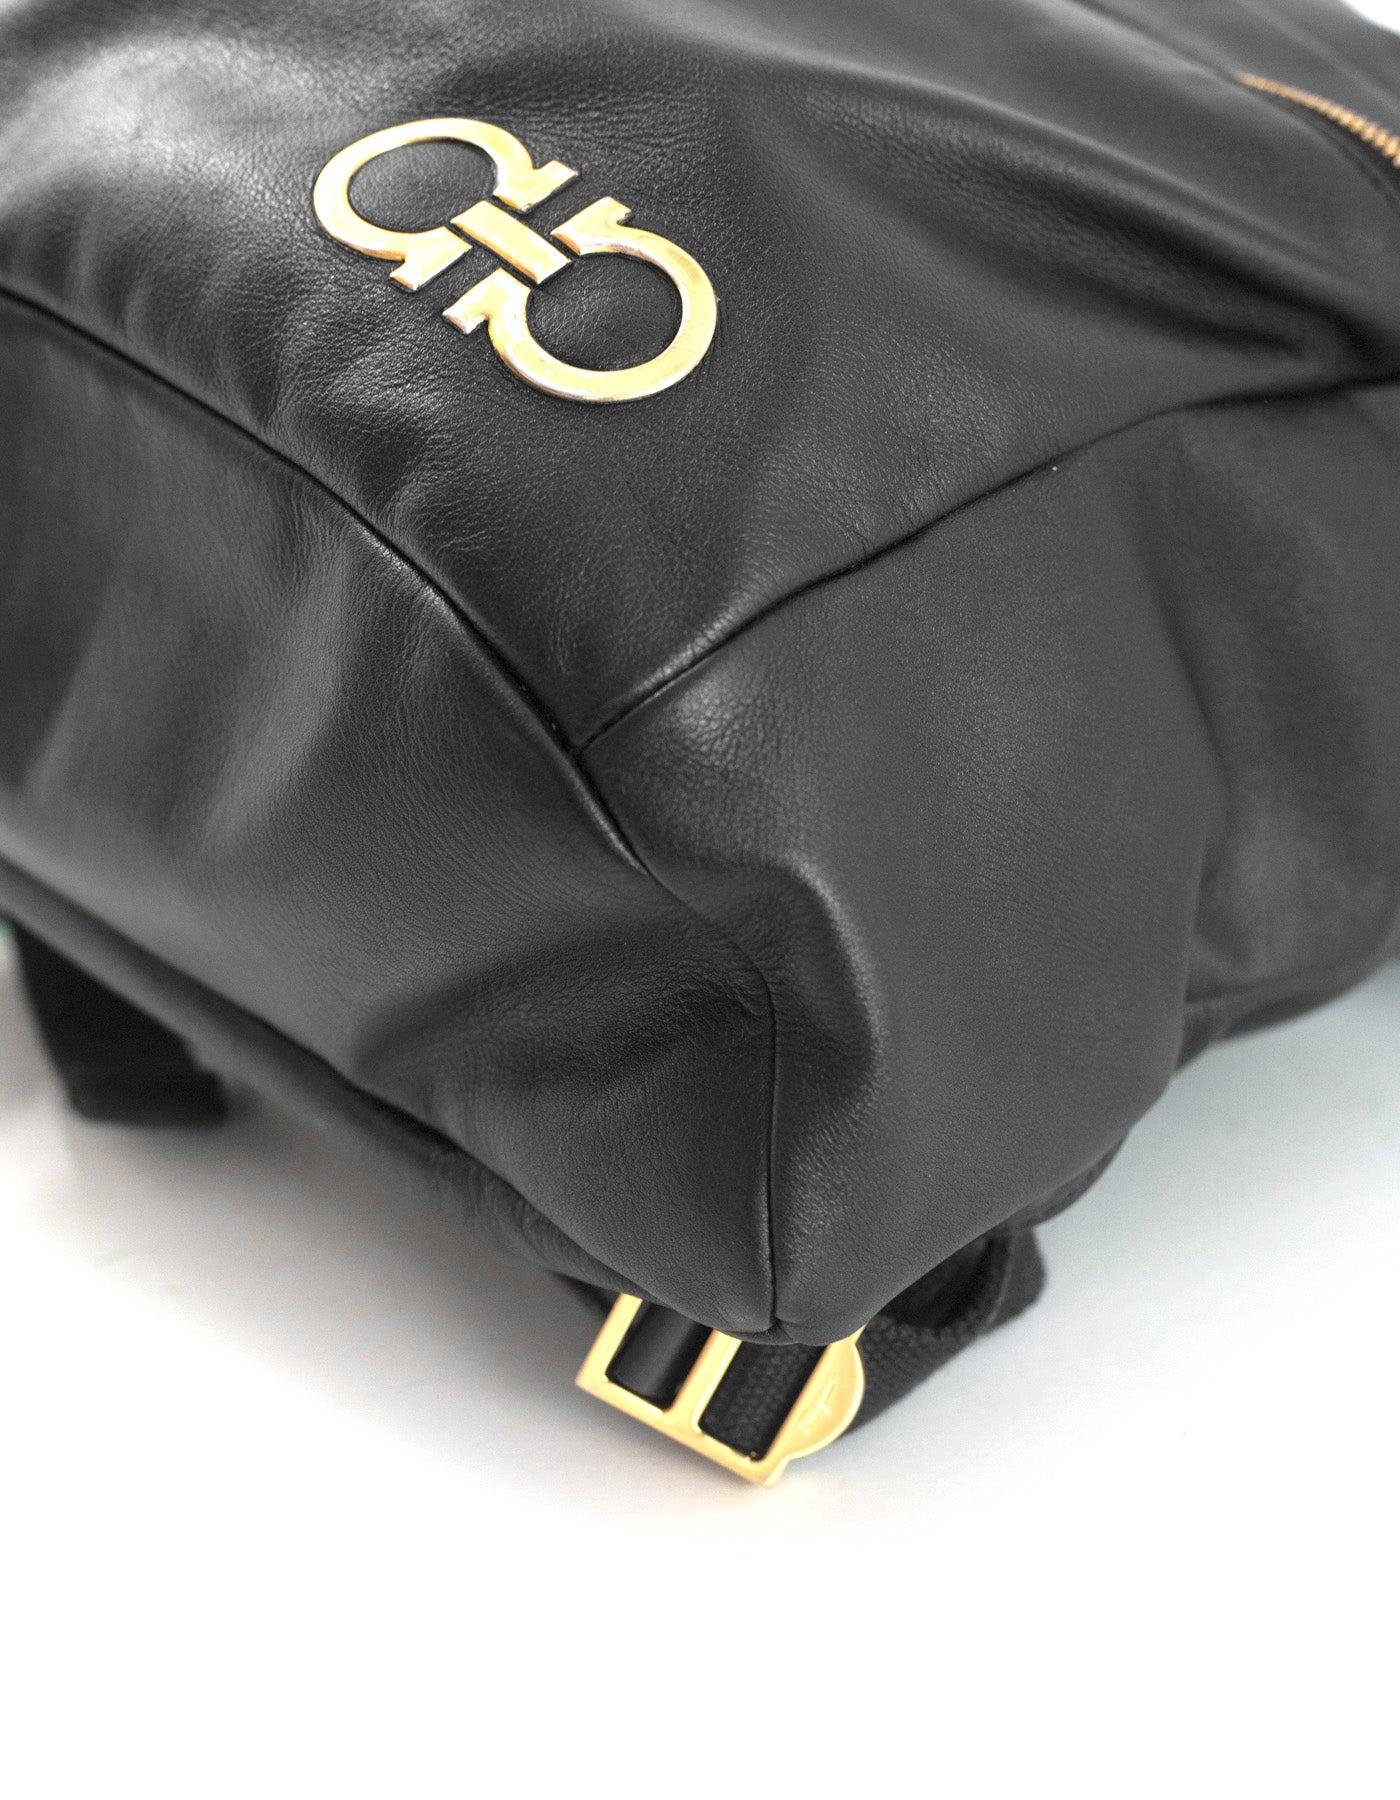 8687da6b7b88 Salvatore Ferragamo Black Nevada Gancini Leather Backpack Bag For Sale at  1stdibs